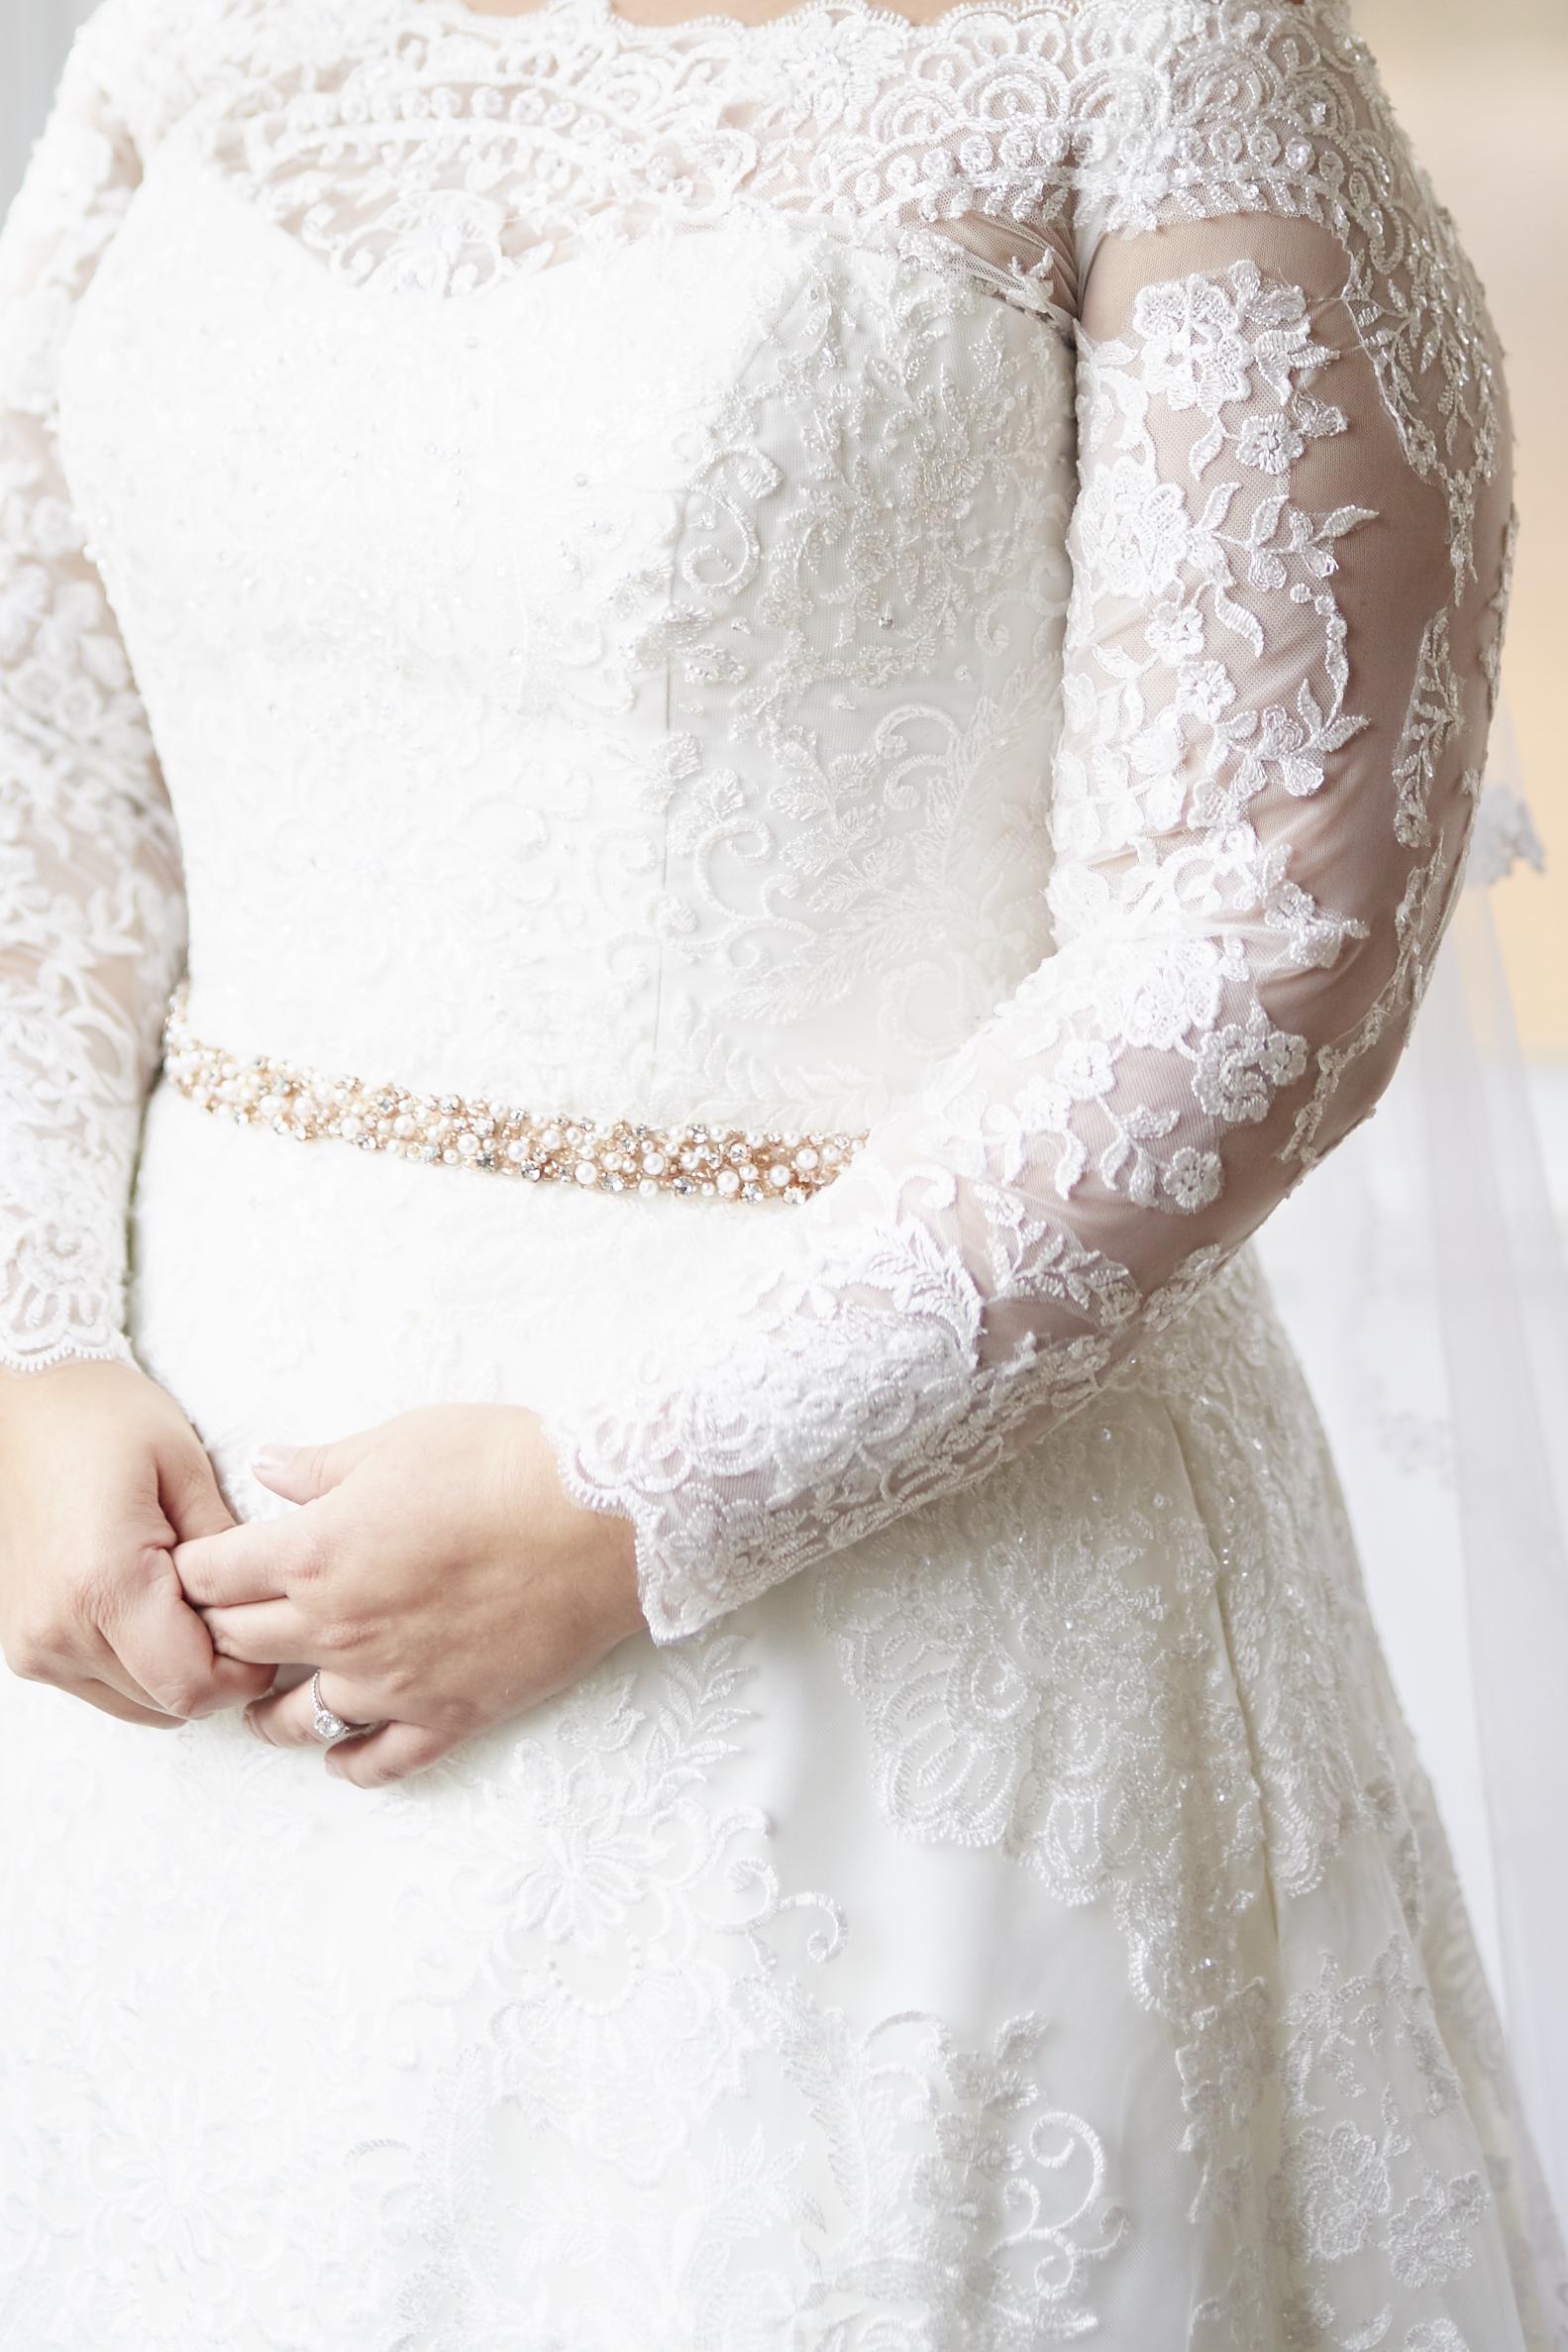 Liz & Josh Wedding -  benromangphoto - 6I5A9835.jpg